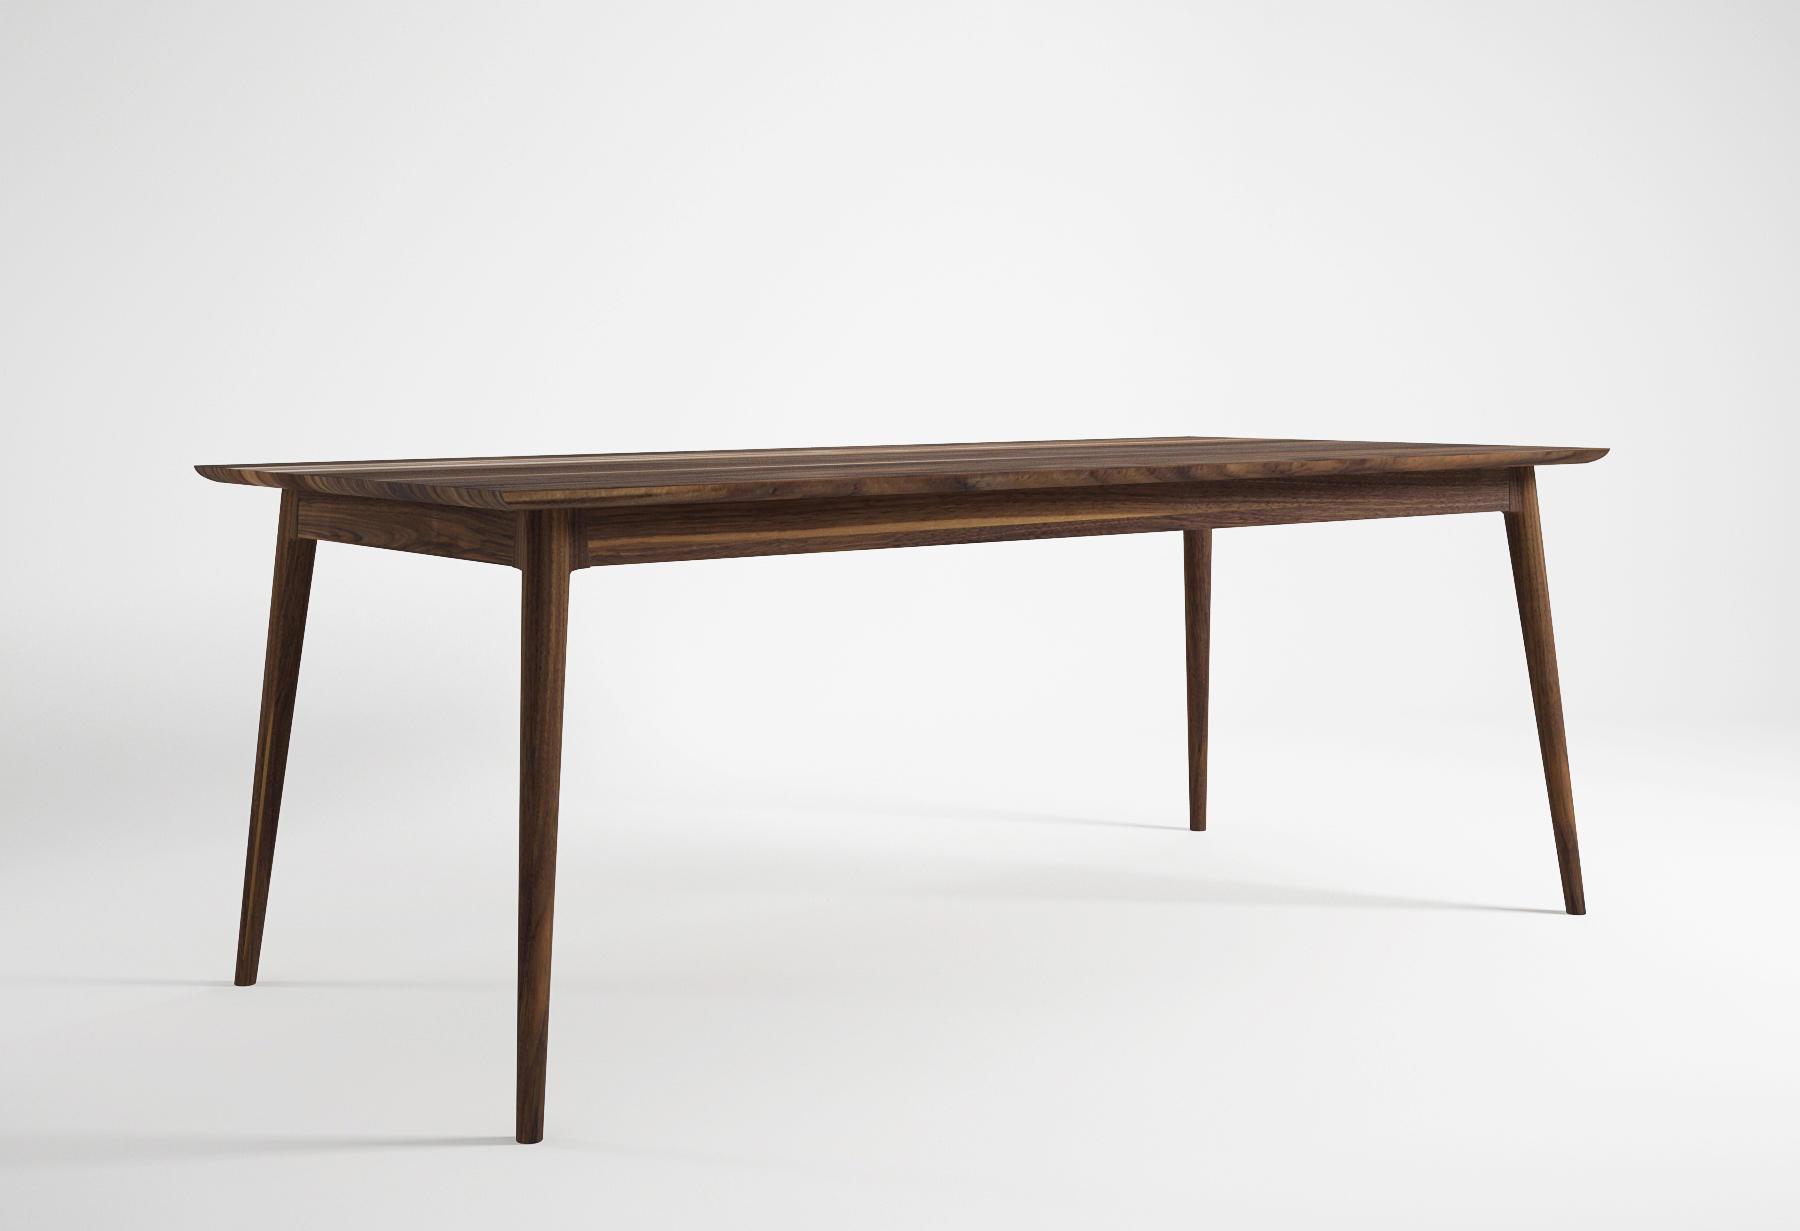 VINTAGE RECTANGULAR DINING TABLE Esstische von Karpenter  : vintage vi09 w rectangular dining table 200x100x78 b of b from www.architonic.com size 1800 x 1231 jpeg 84kB